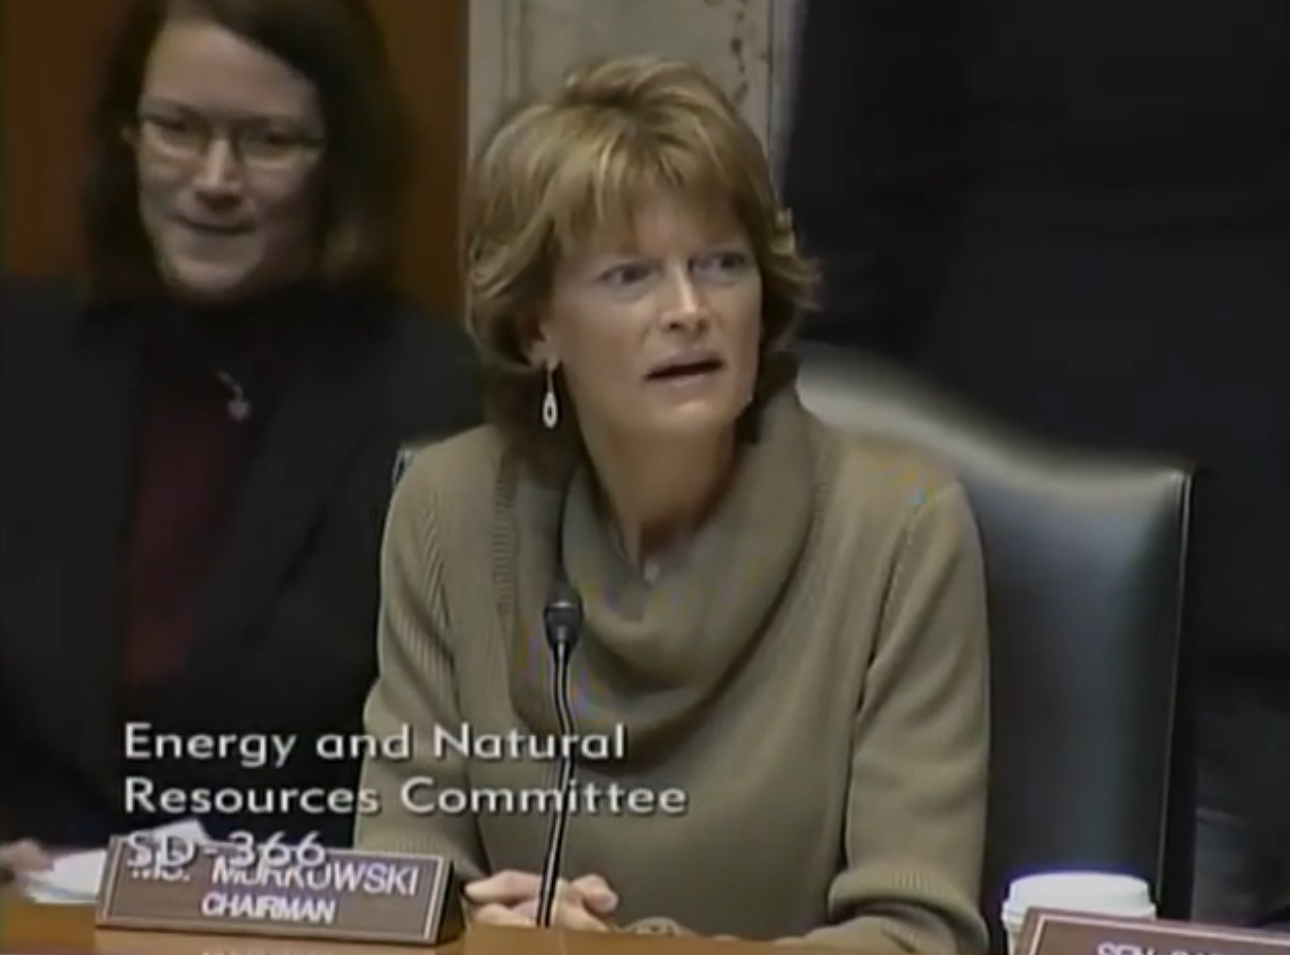 Murkowski energy committee